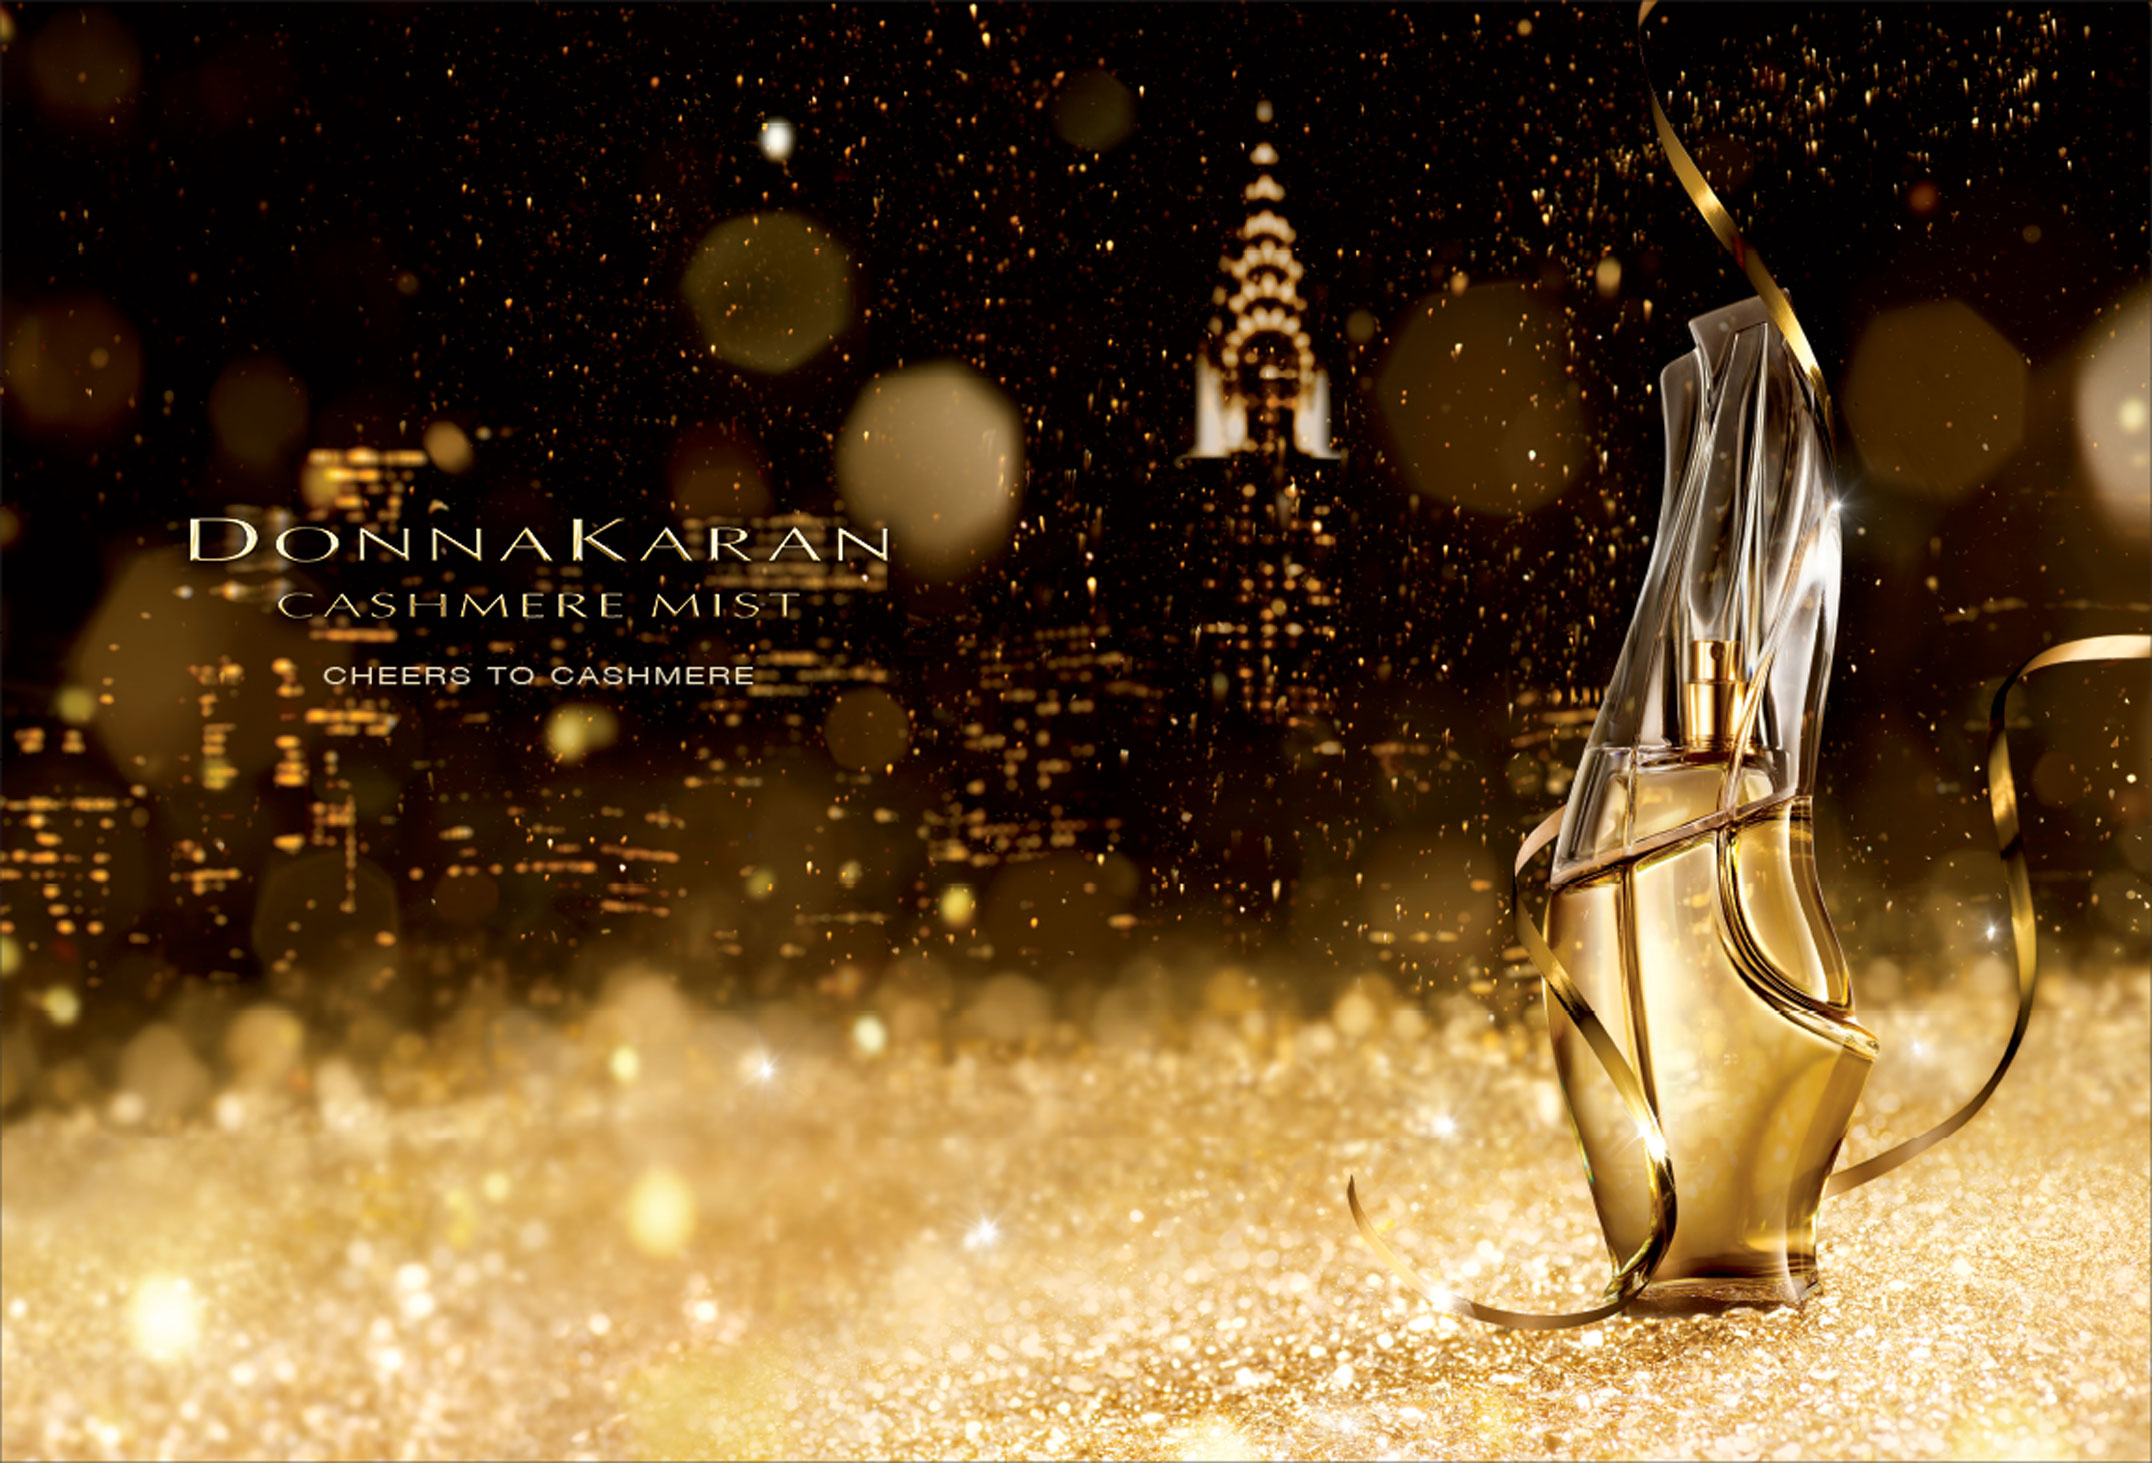 DK_CashmereMist_FY19_Holiday_Spread.jpg